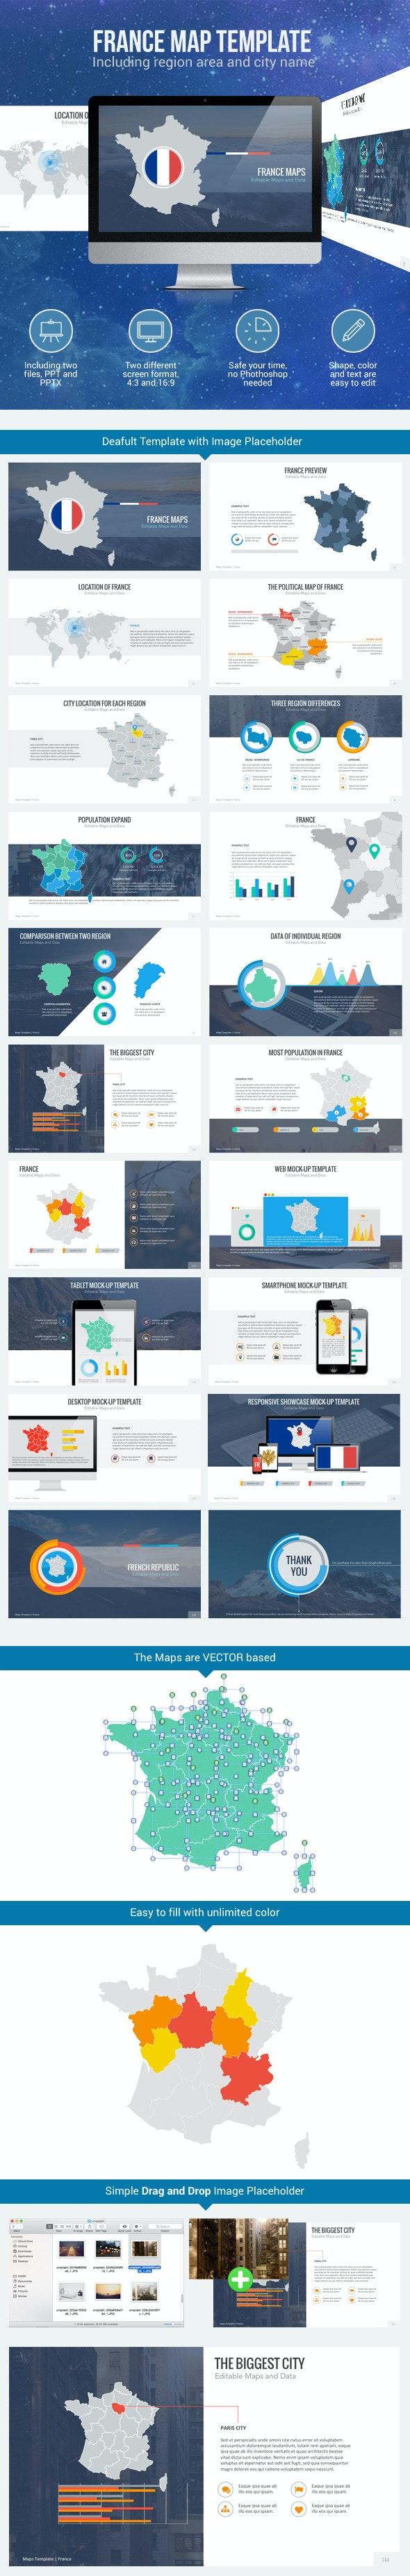 France Map - Editable Map Presentation - PowerPoint Templates Presentation Templates